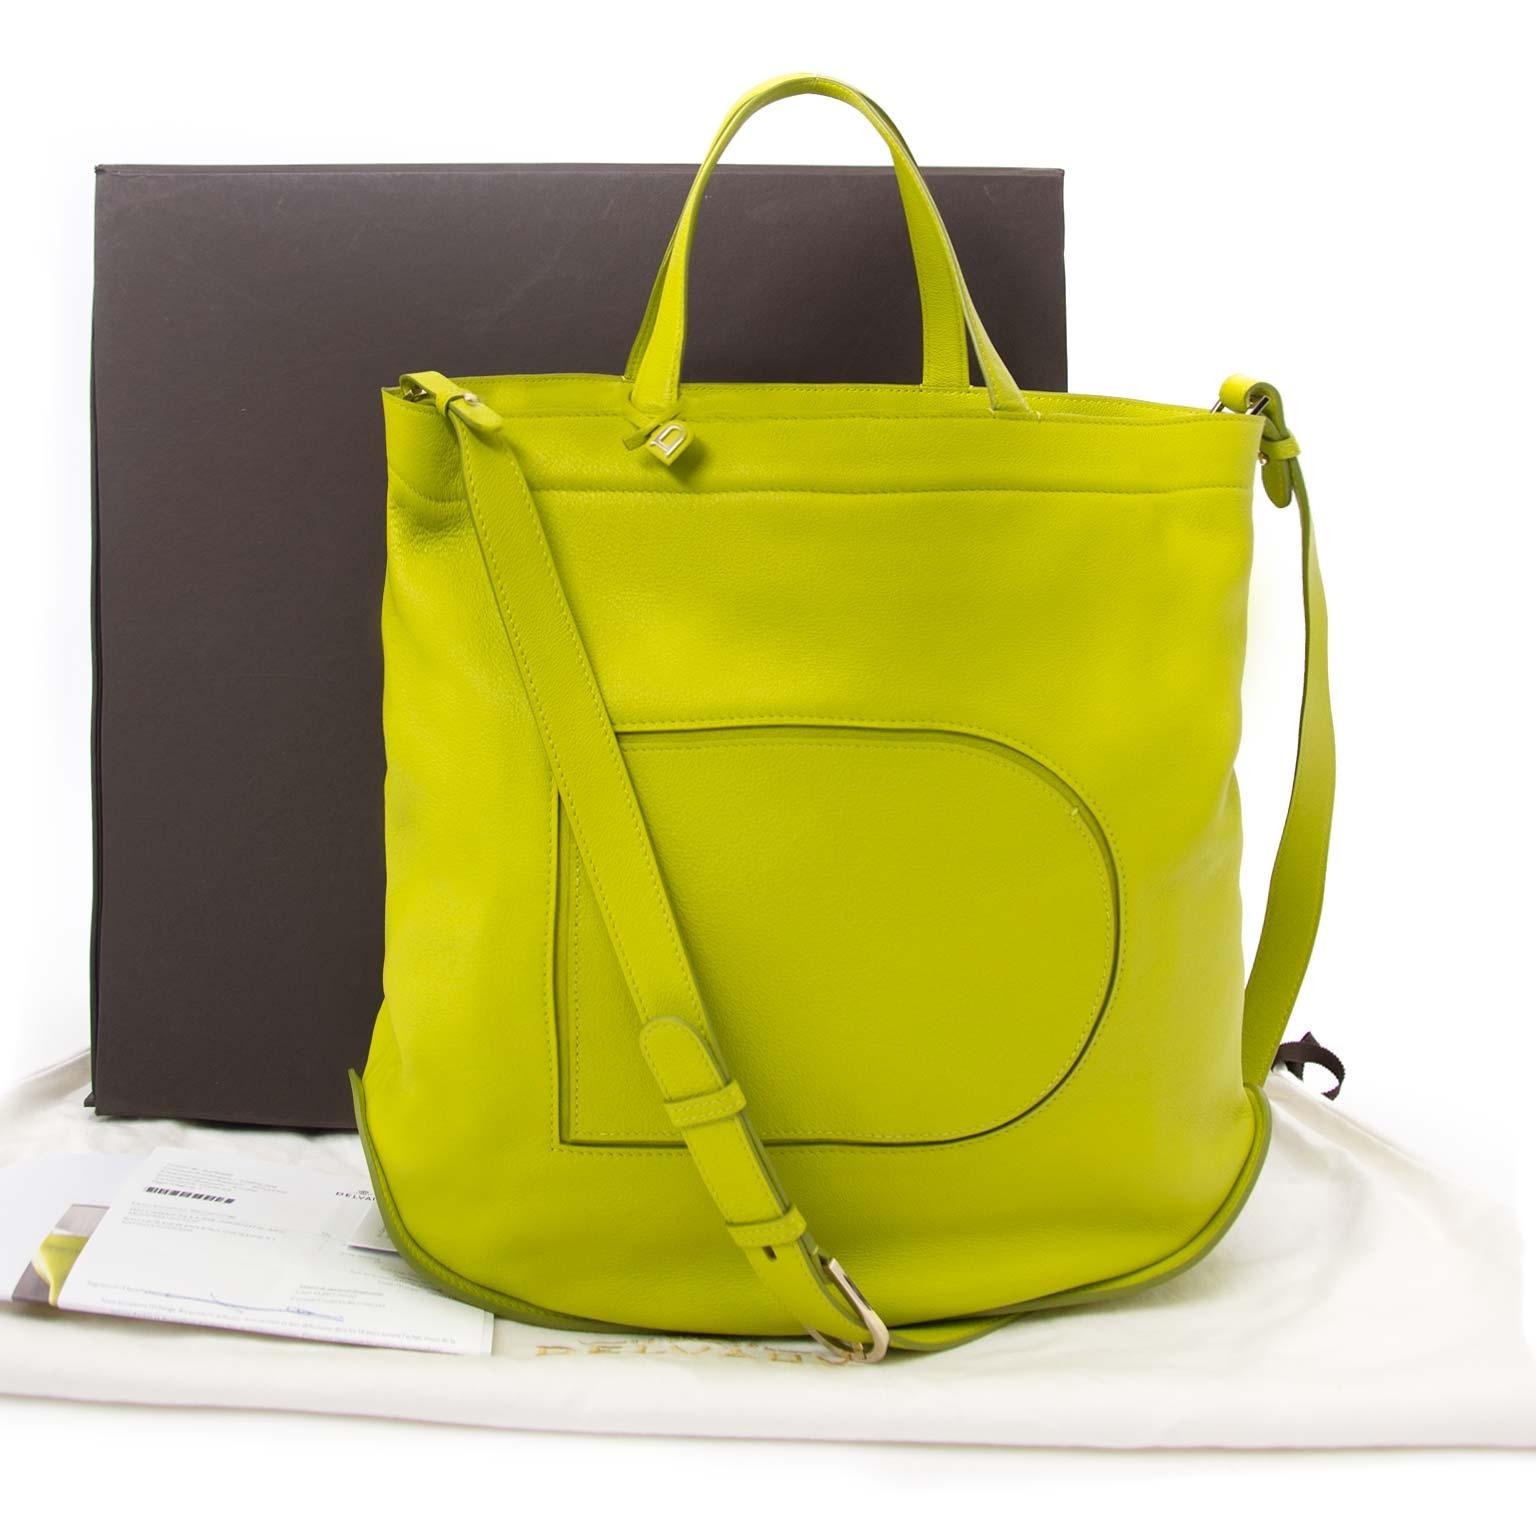 koop online tegen de beste prijs Delvaux Le Pin Cabas Allure Absinthe Shoulder Bag